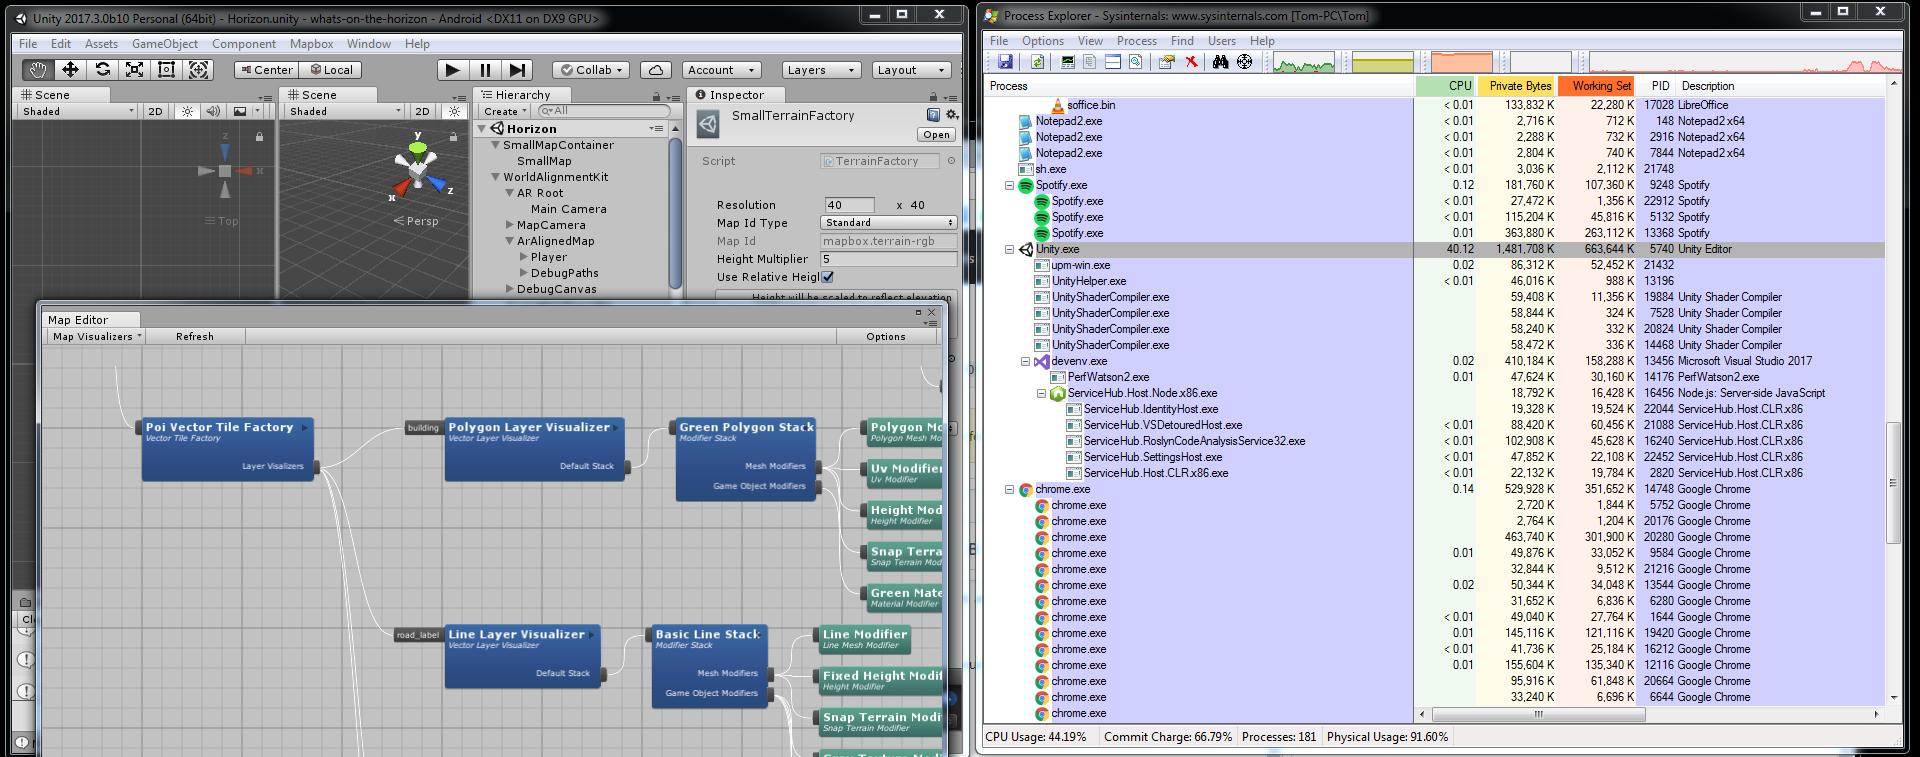 MapEditor Unity Window High CPU · Issue #392 · mapbox/mapbox